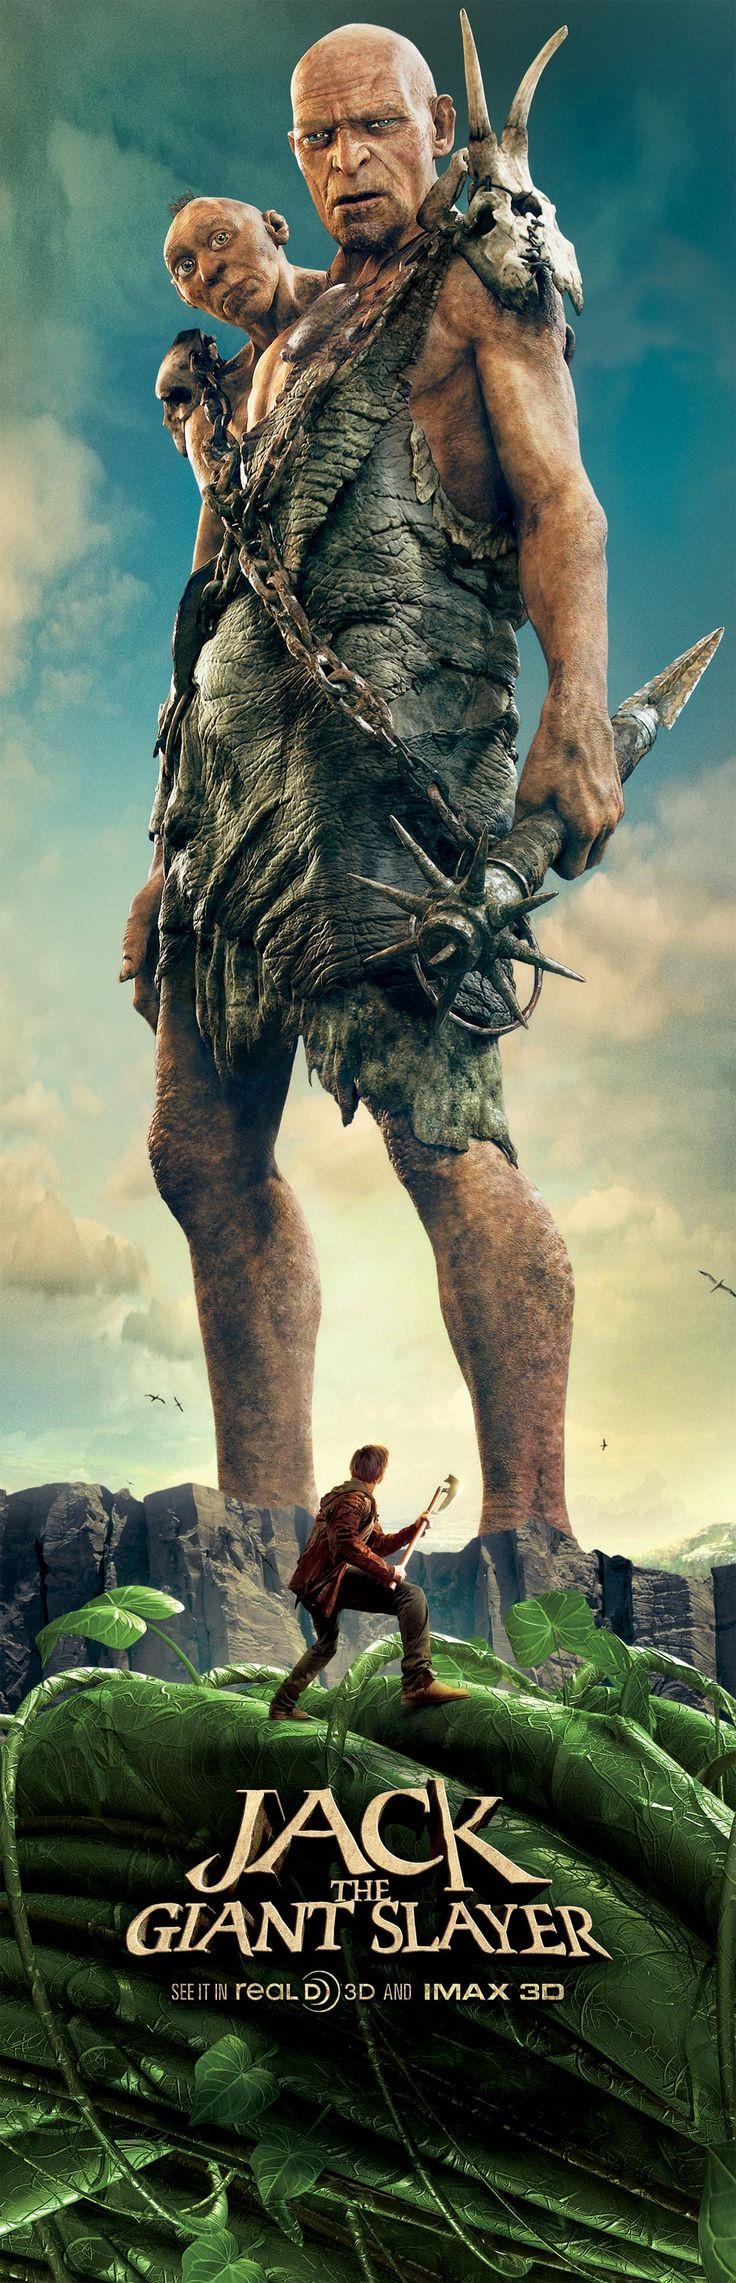 Jack the Giant Slayer - Bryan Singer